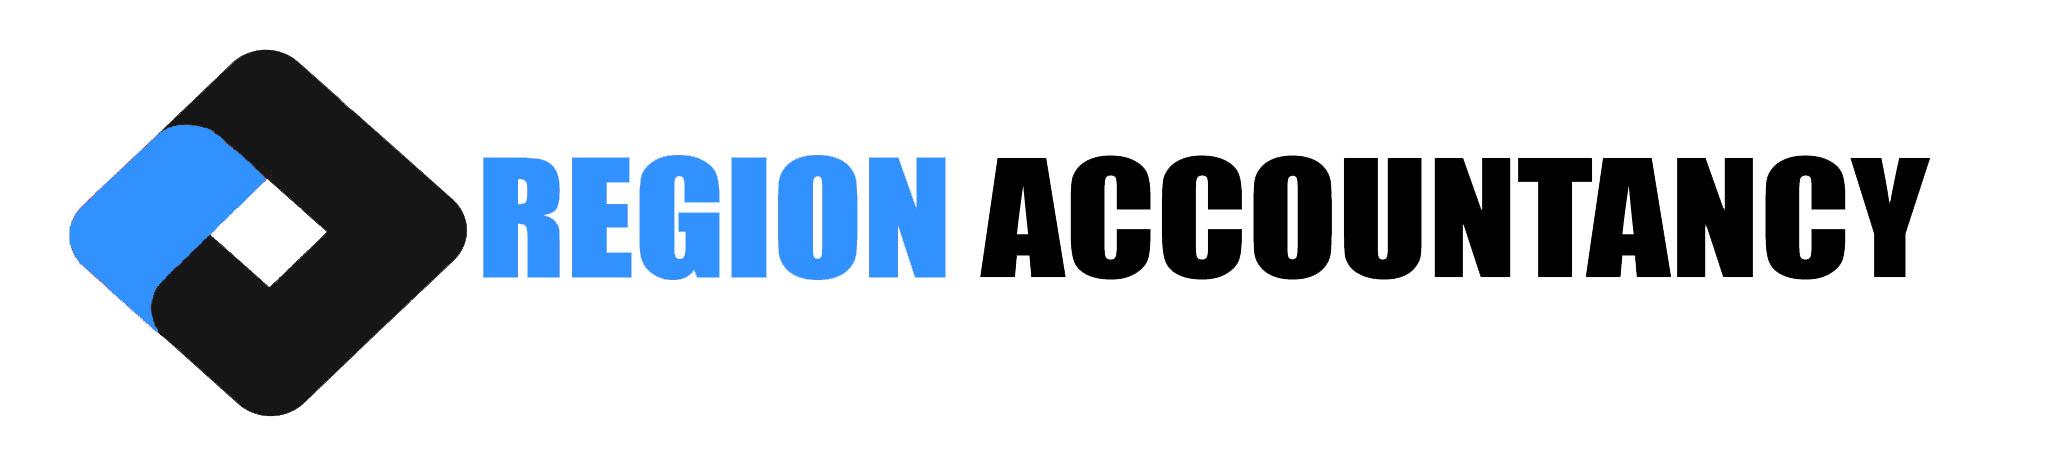 Region, Accountancy, Logo, Region Accountancy, Accountants